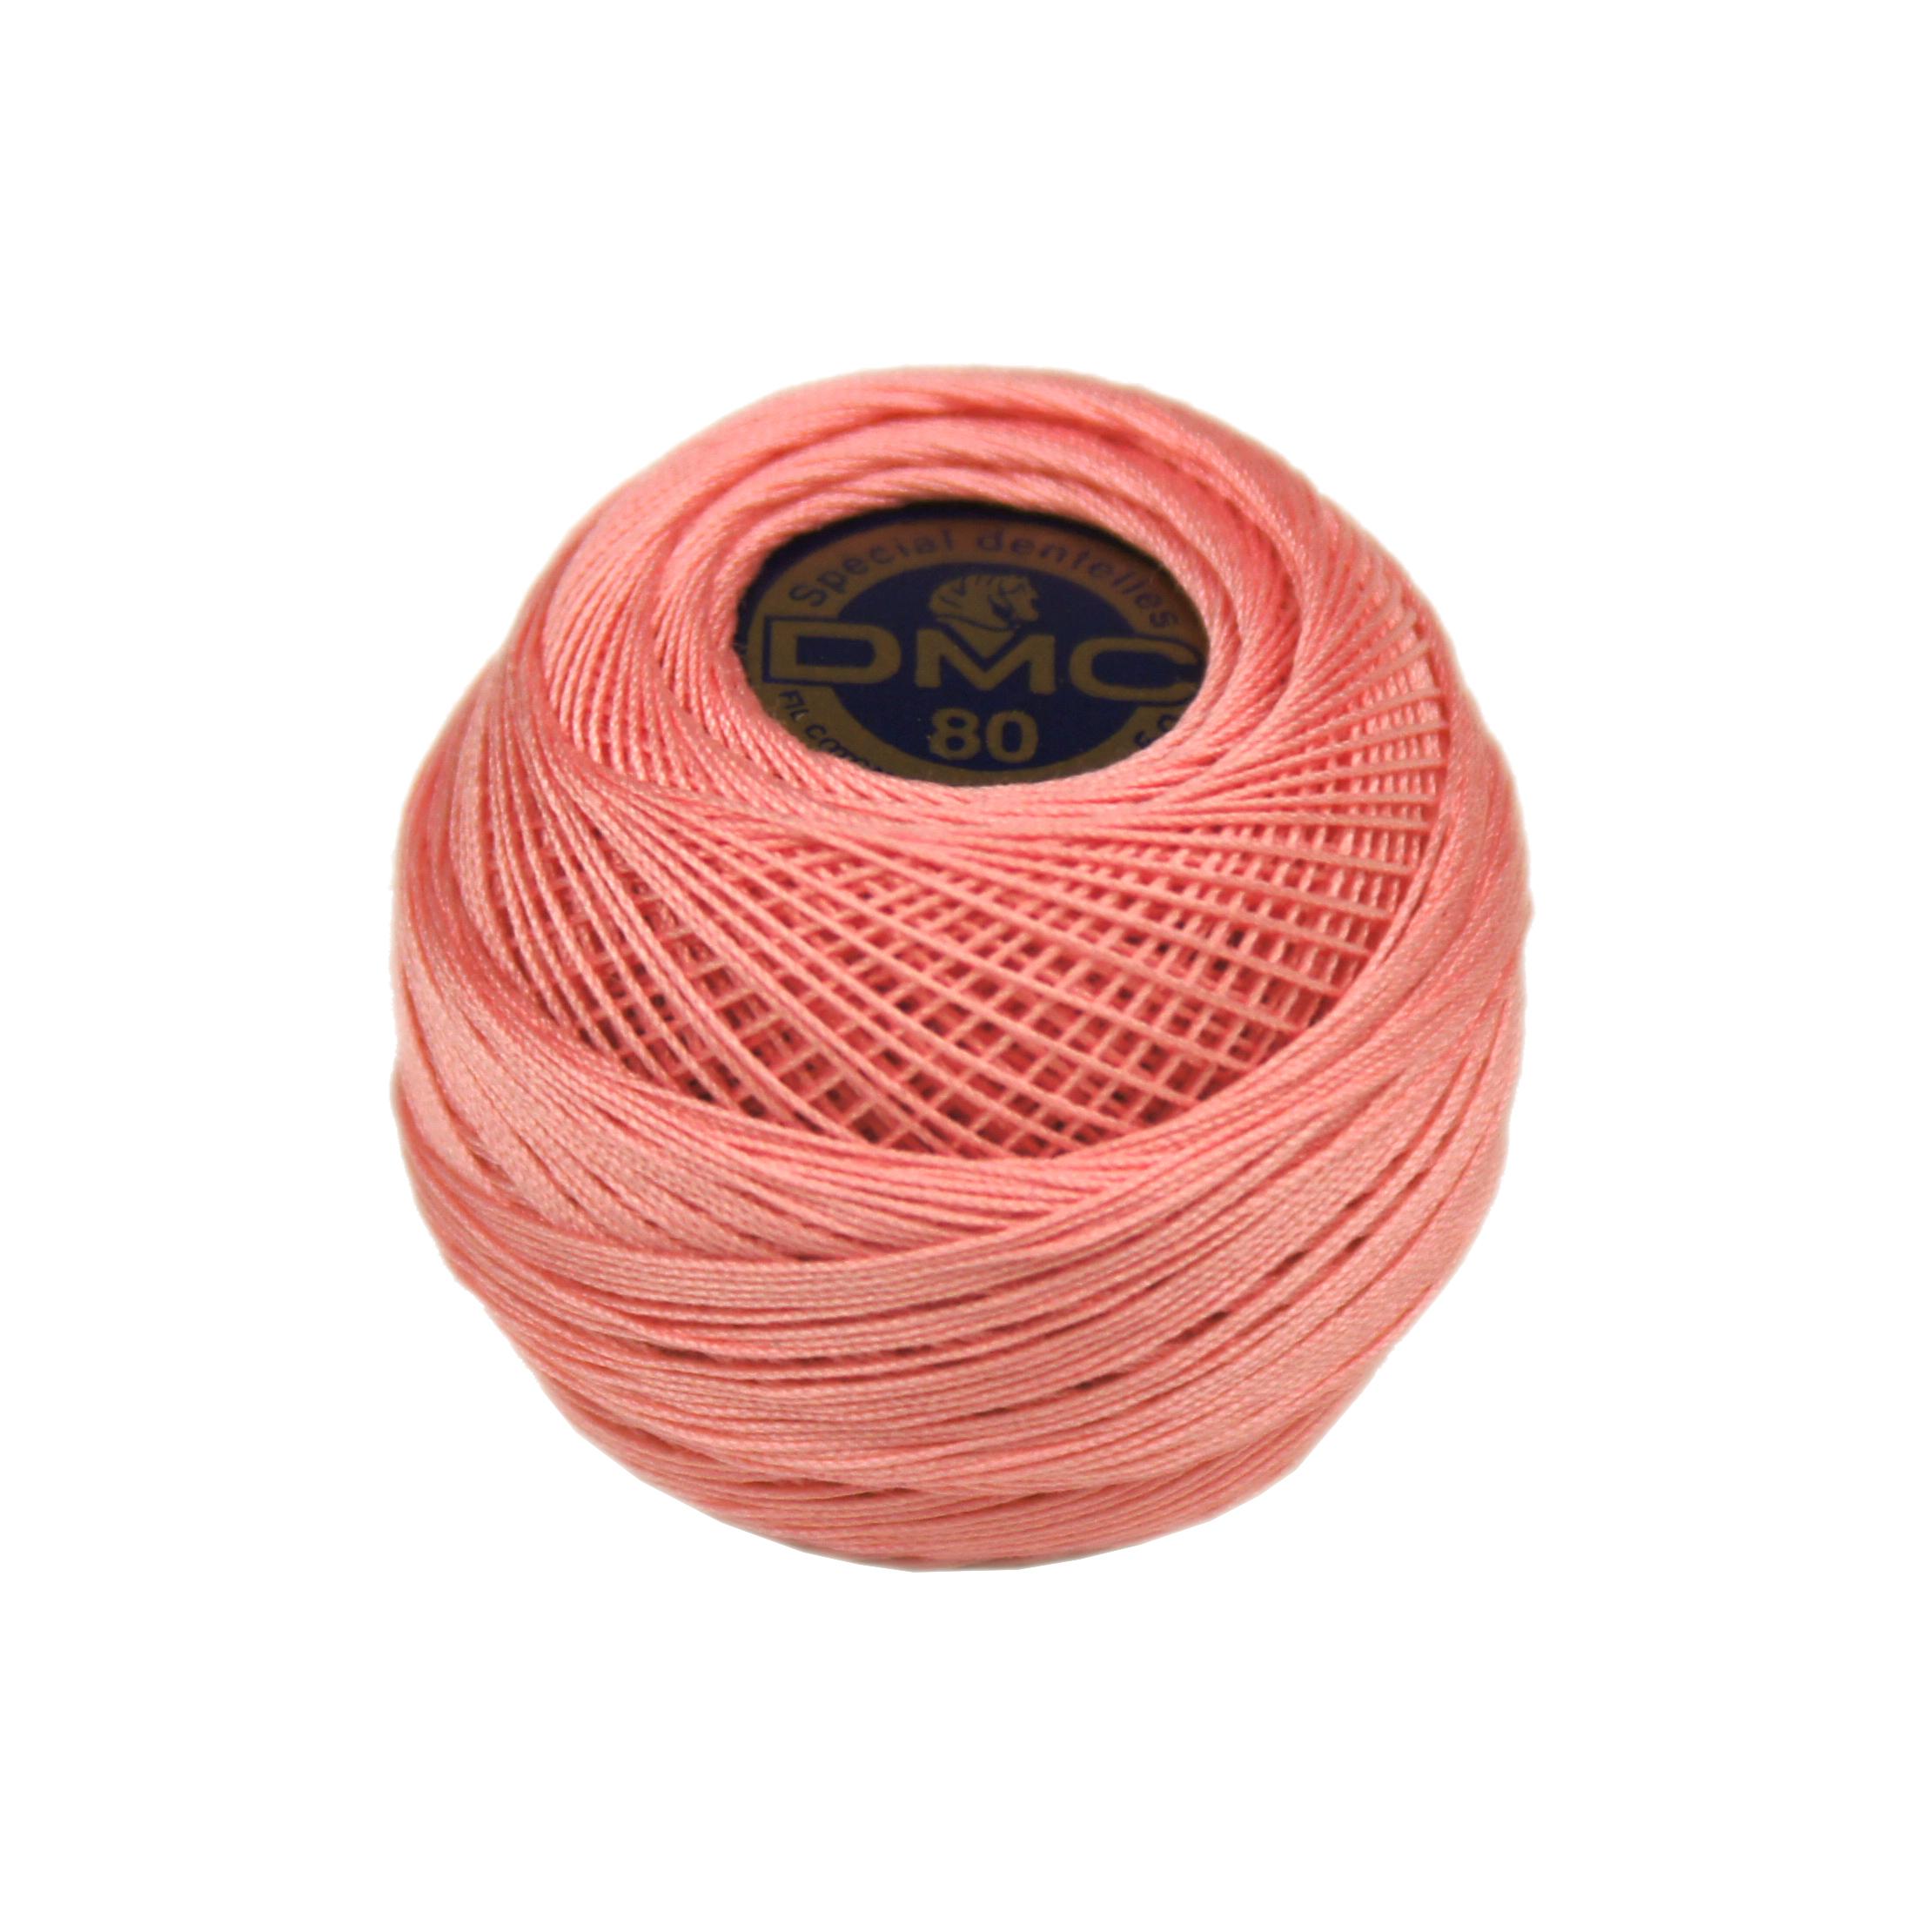 DMC Dentelles 3326 baby roze